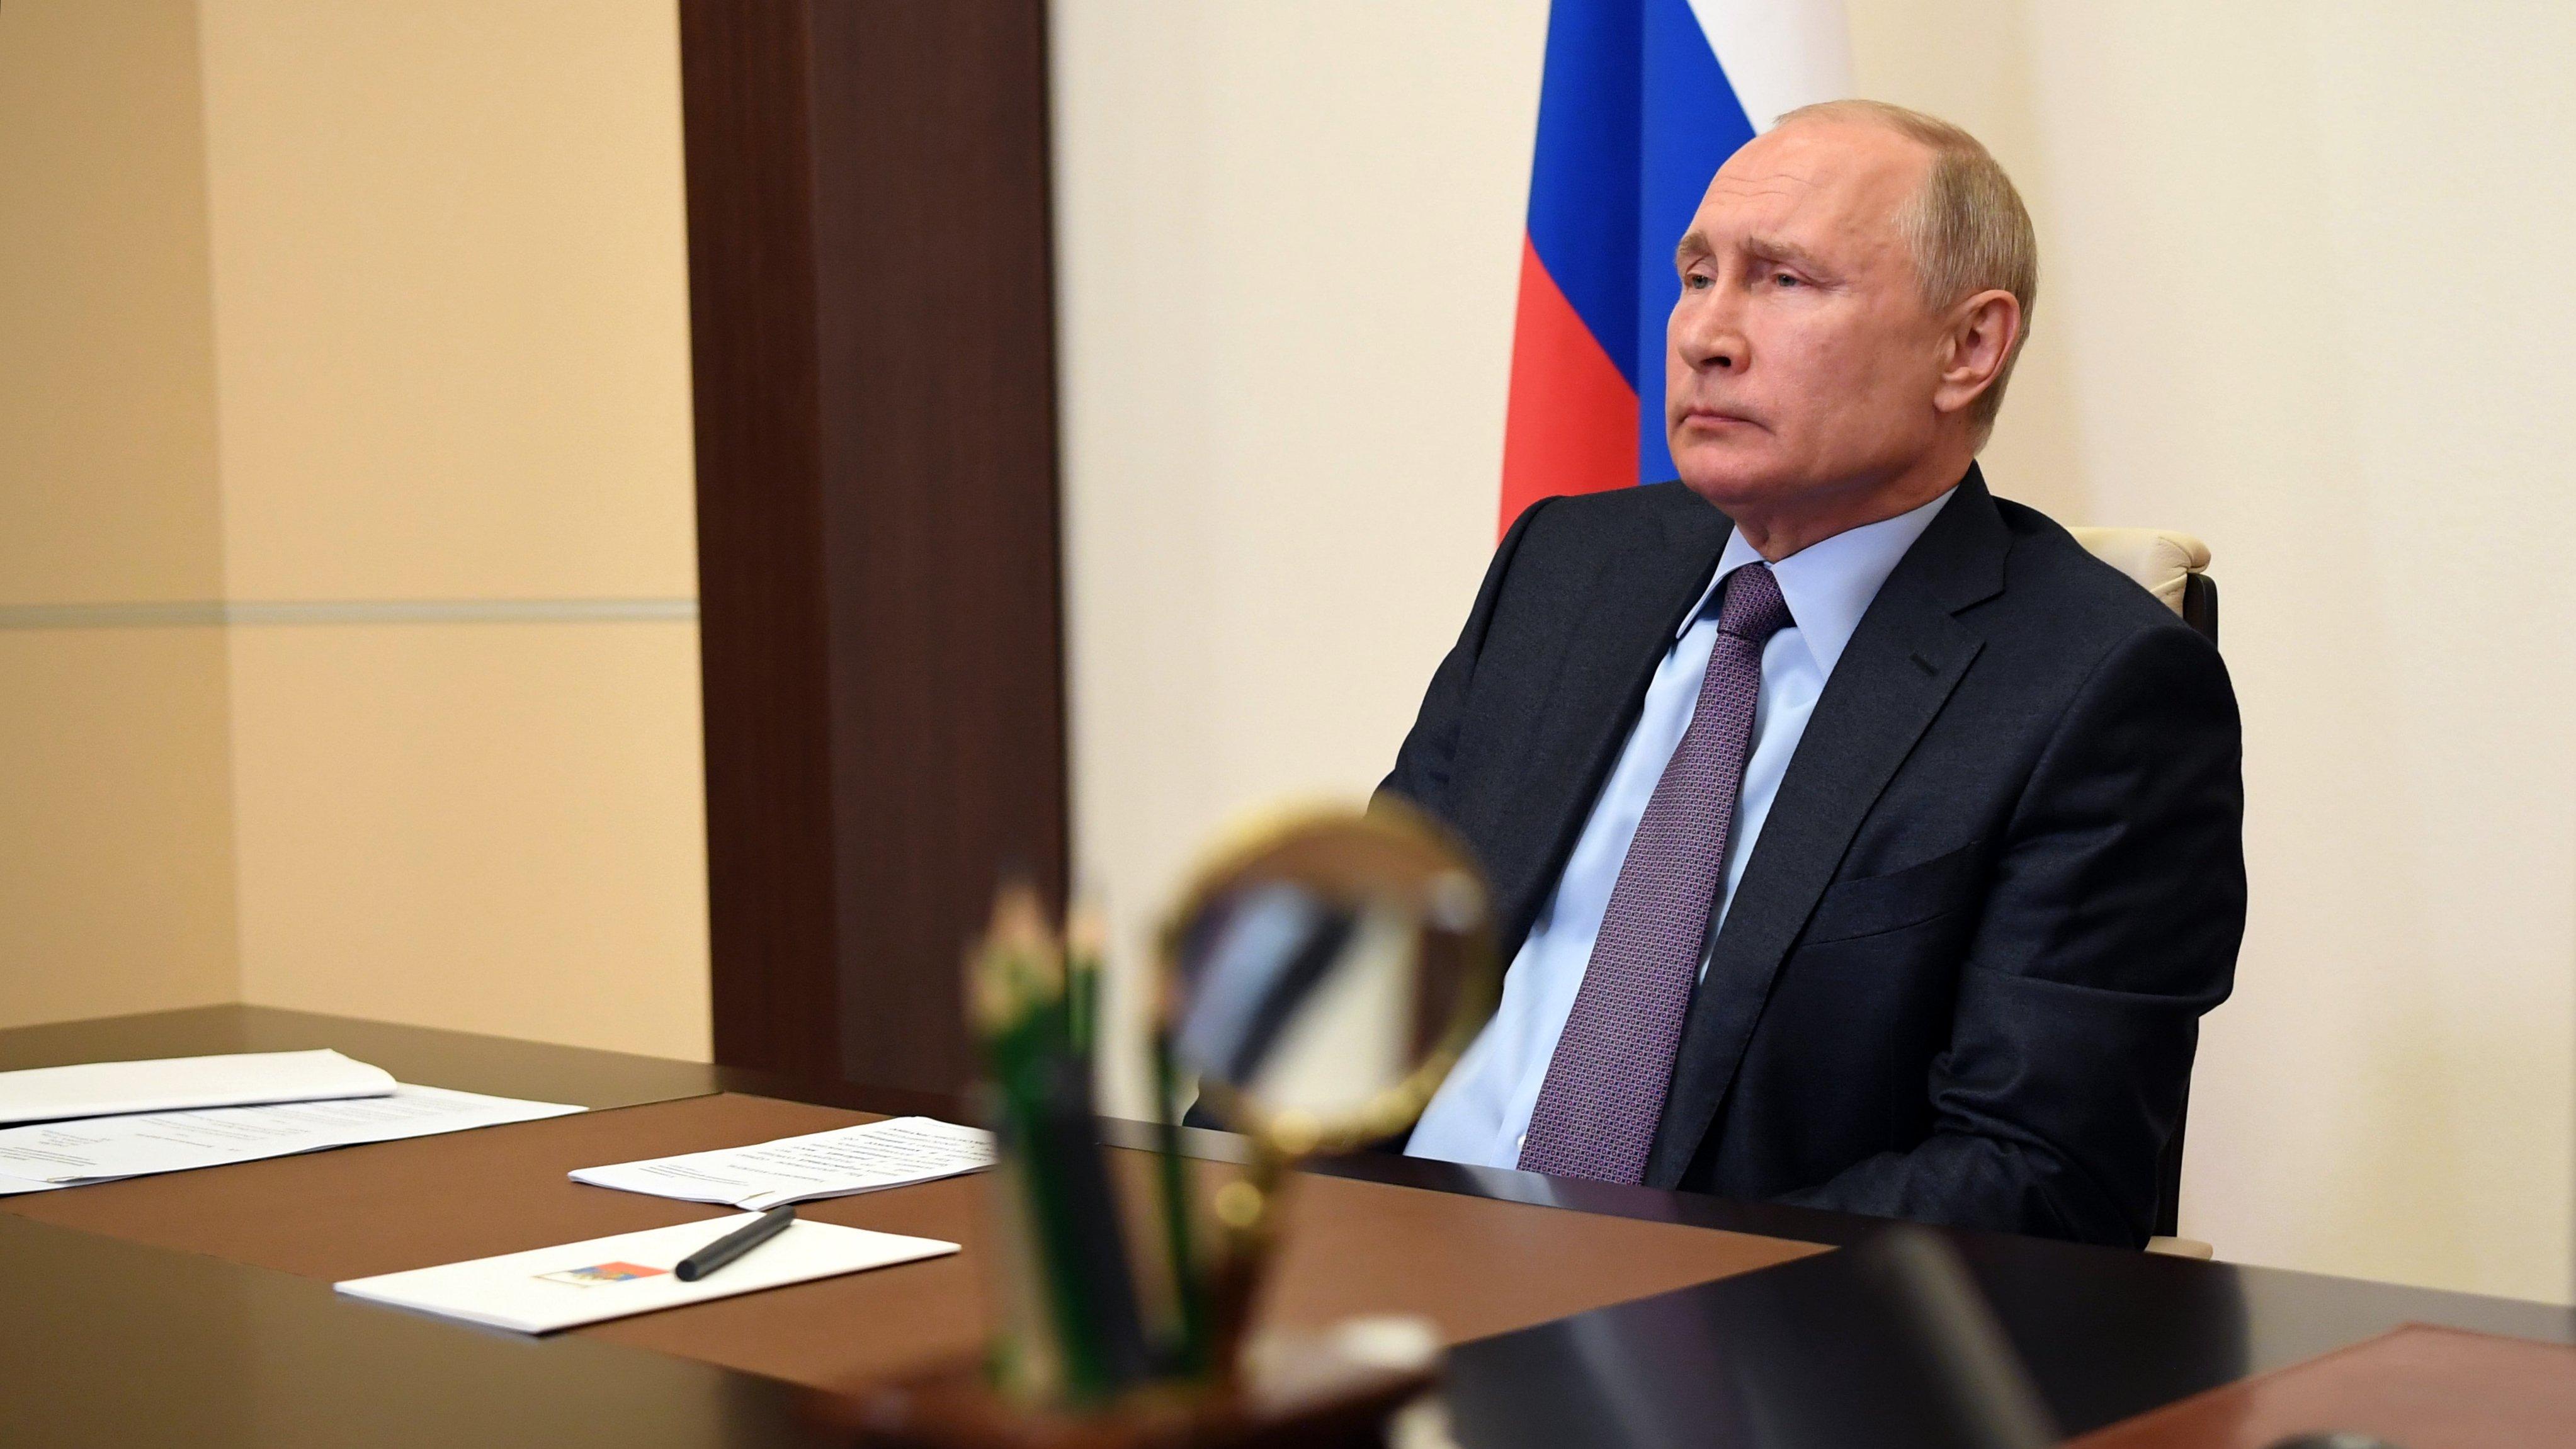 Rusya referandumda internet ve postayla oy kullanacak